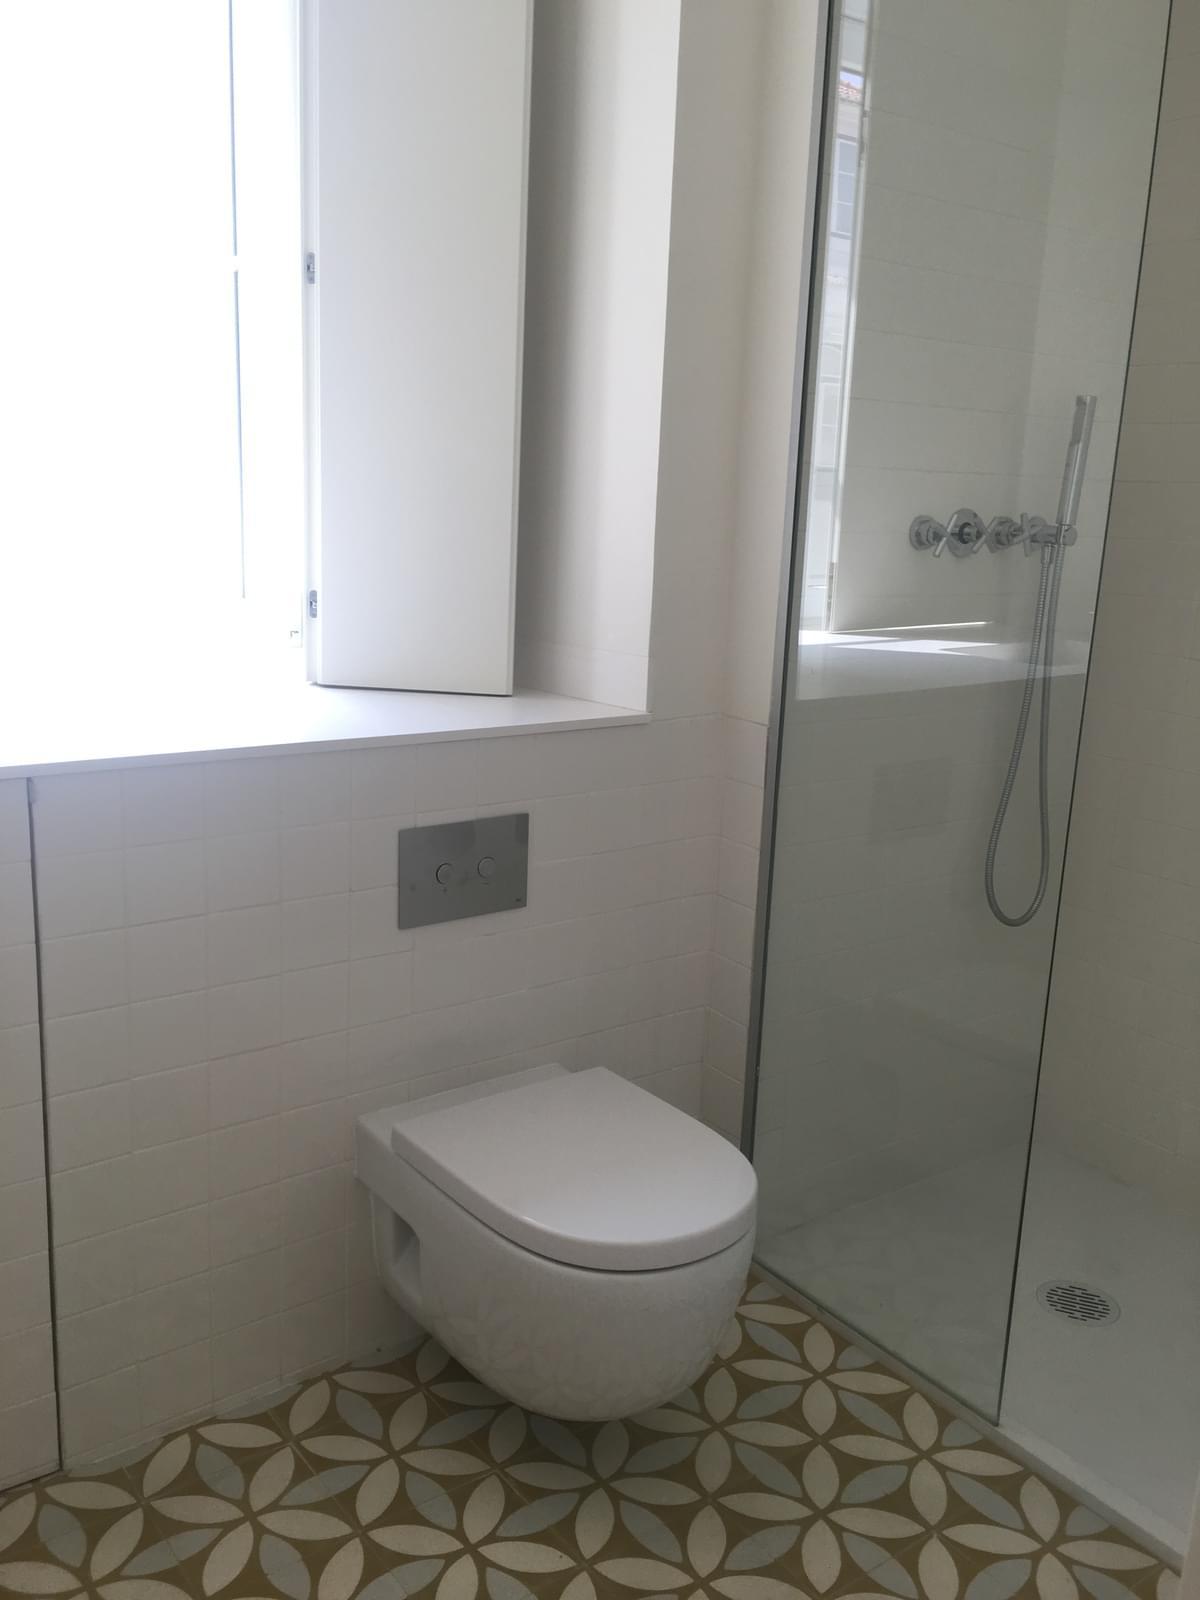 pf17866-apartamento-t1-lisboa-b8d15759-9ce3-403d-baef-d2f6a14a041f